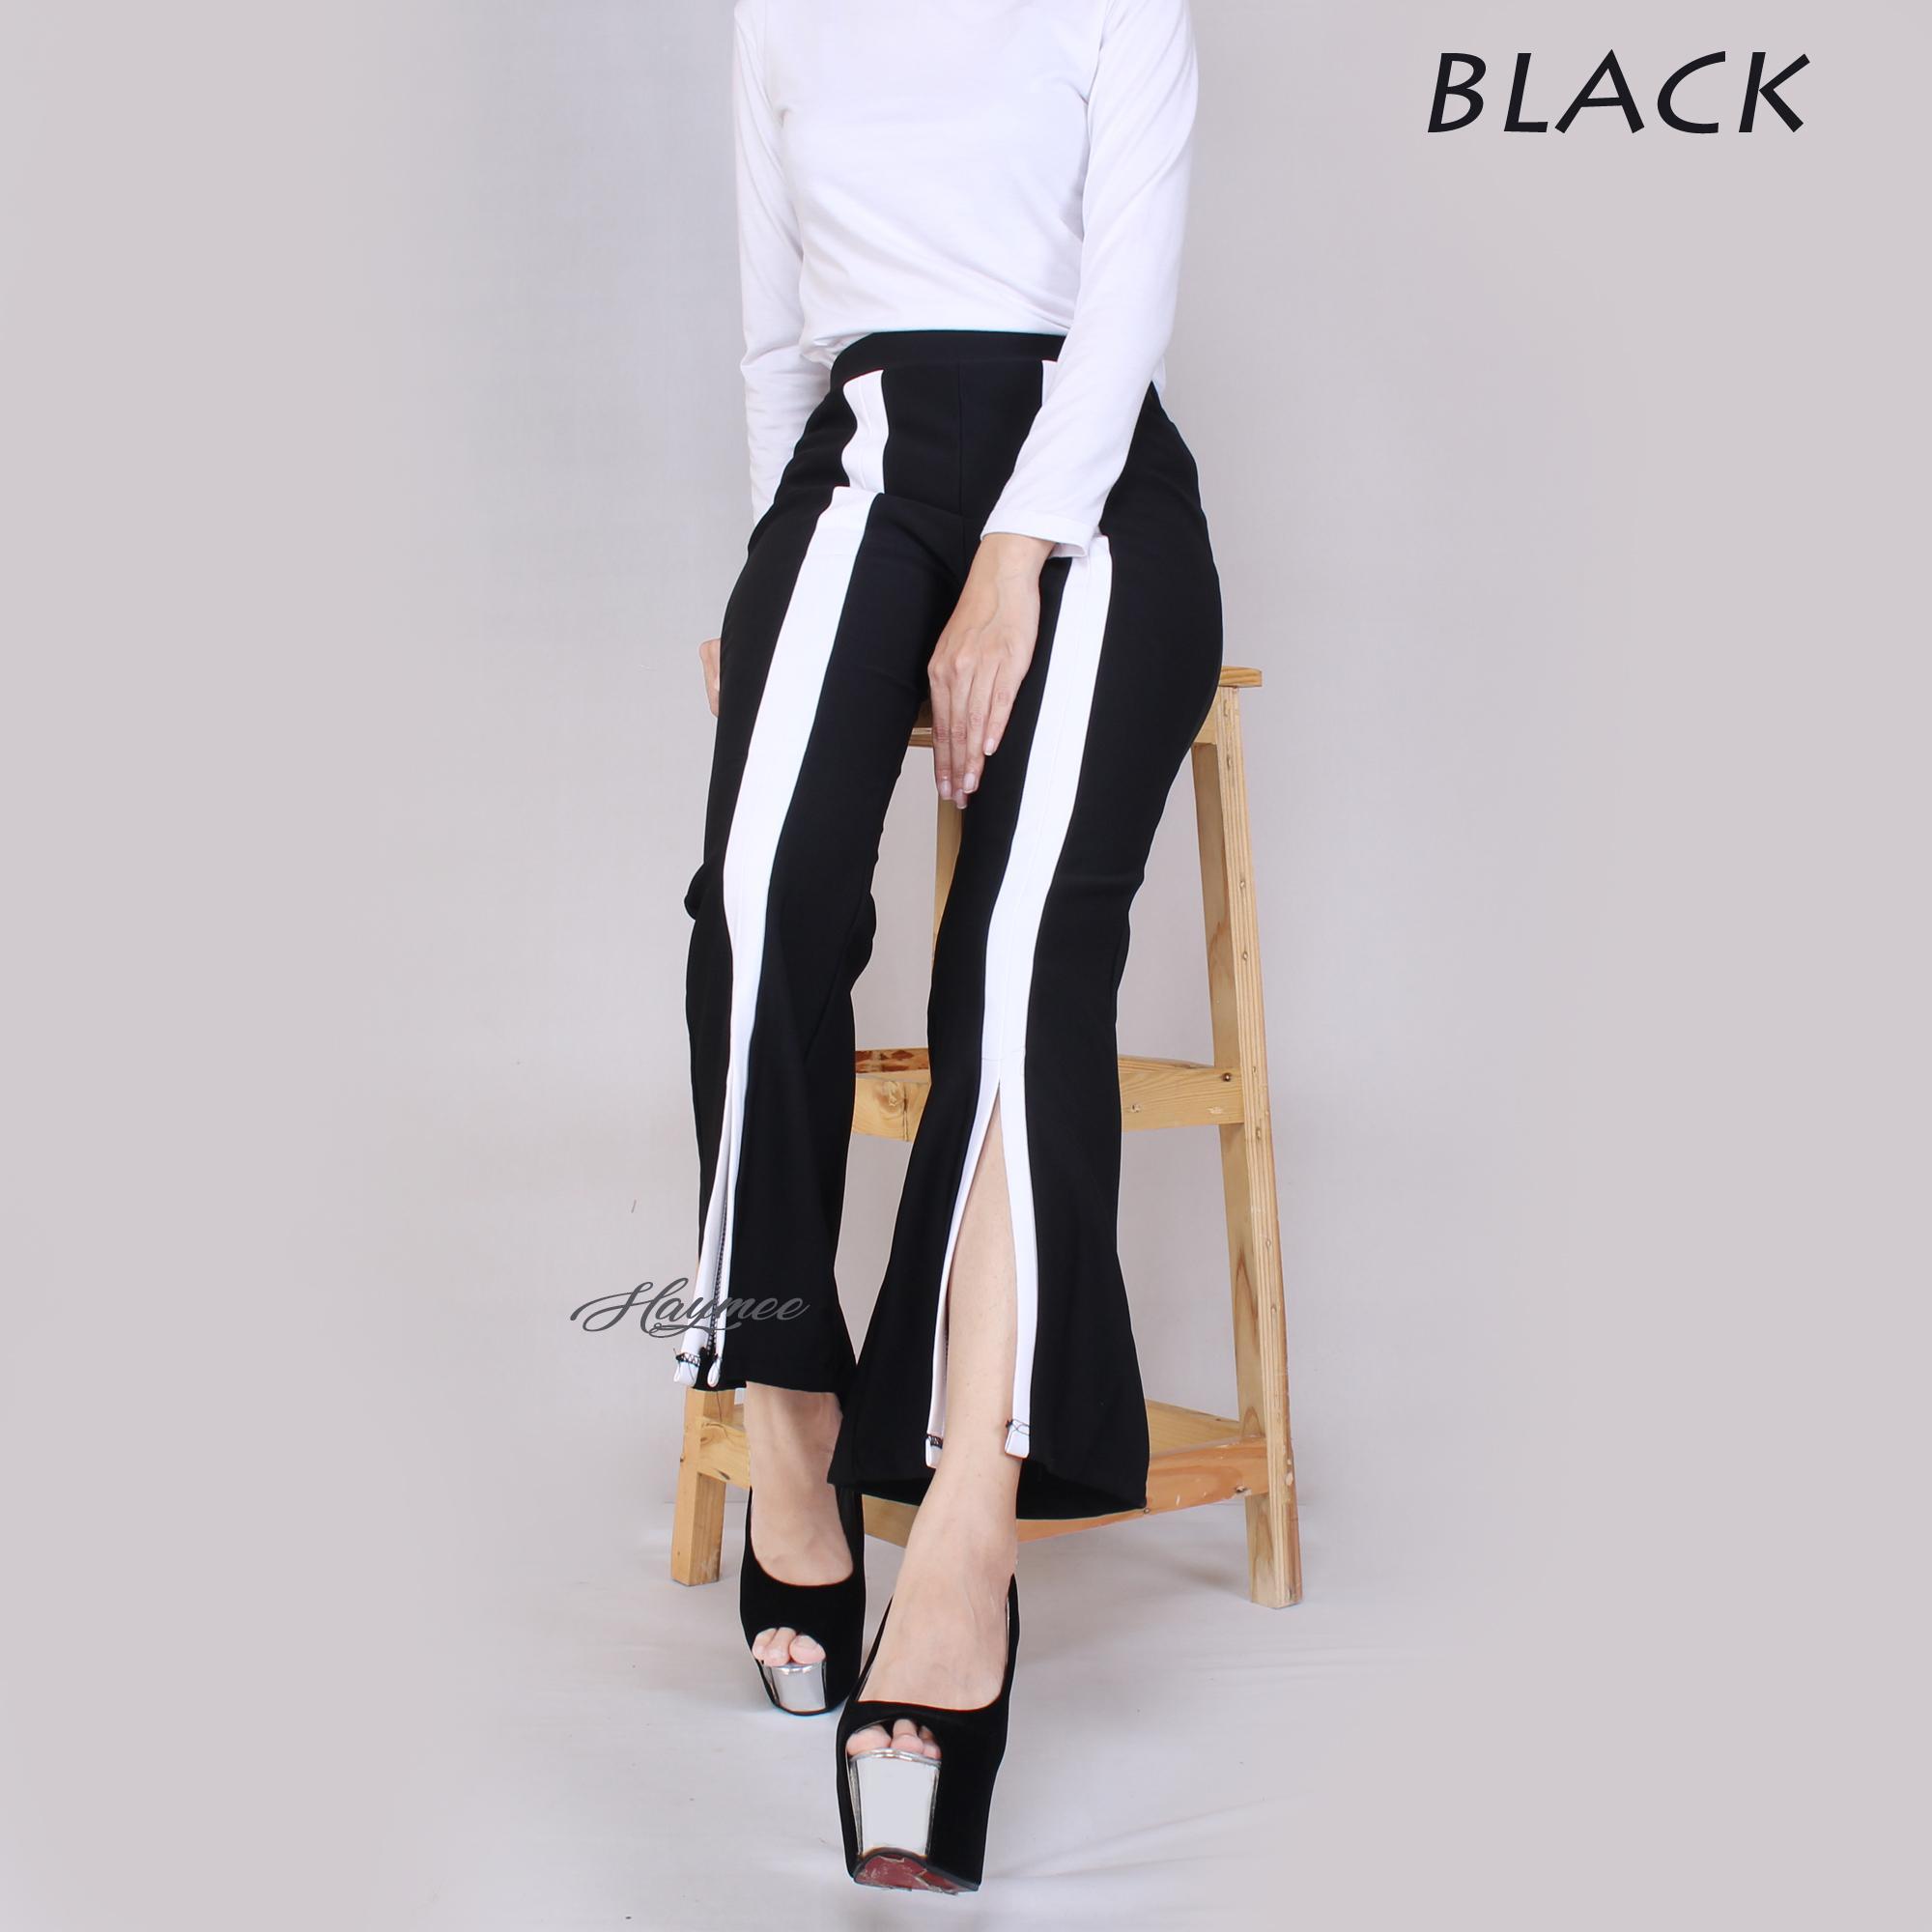 HaymeeStore Celana Cutbray Office Pants Import Bawahan Cutbrai Wanita Celana Premium Scuba Cewek